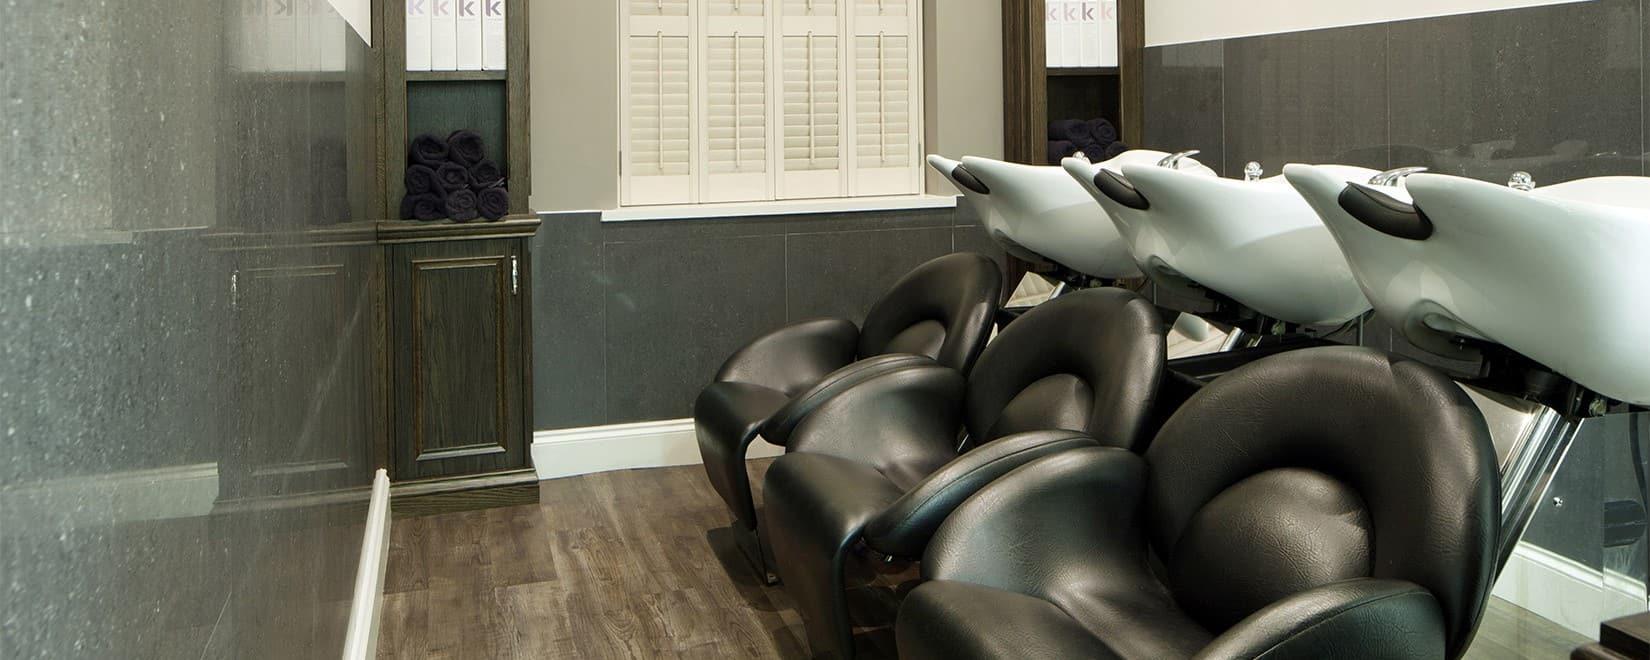 M Salons - Hairdressers Bishops Stortford - Interior Washing